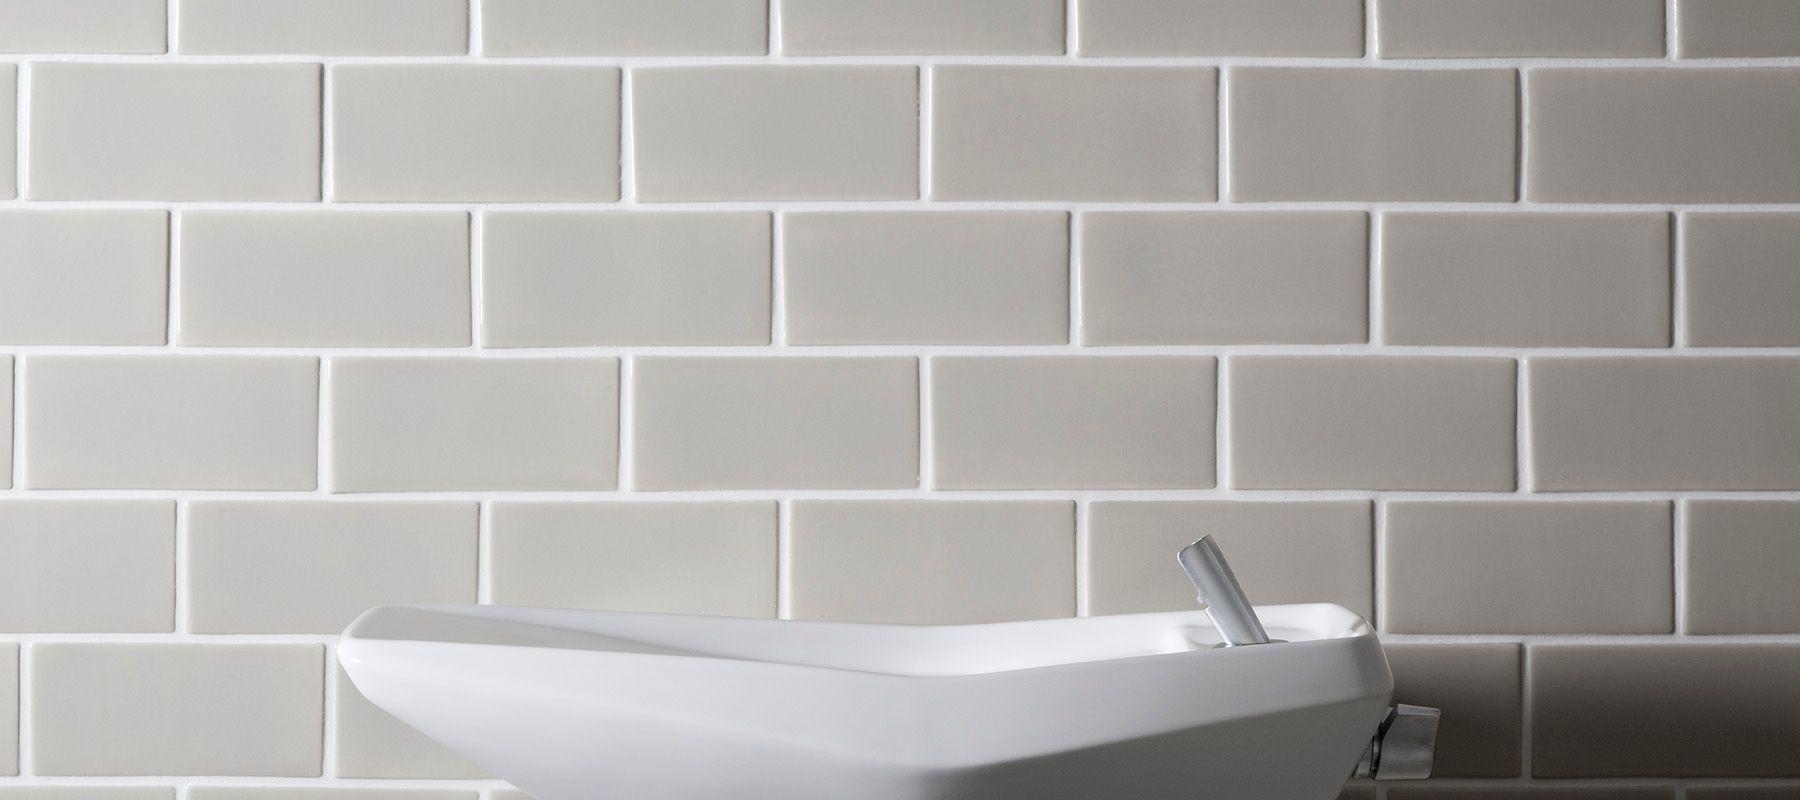 Drinking Fountains | Commercial Bathroom | Bathroom | KOHLER